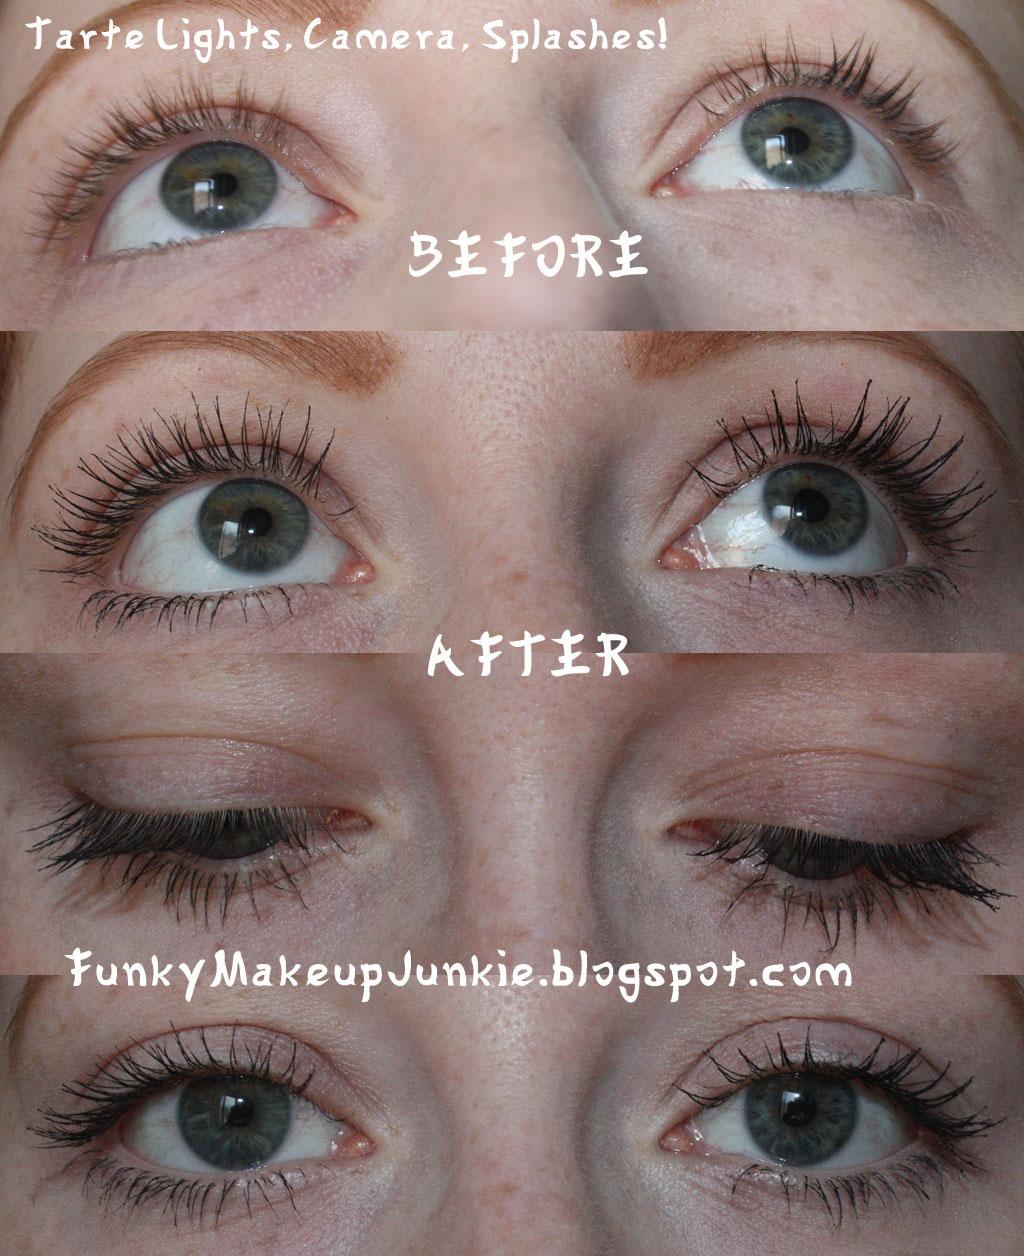 Captivating Funky Makeup Junkie Design Inspirations